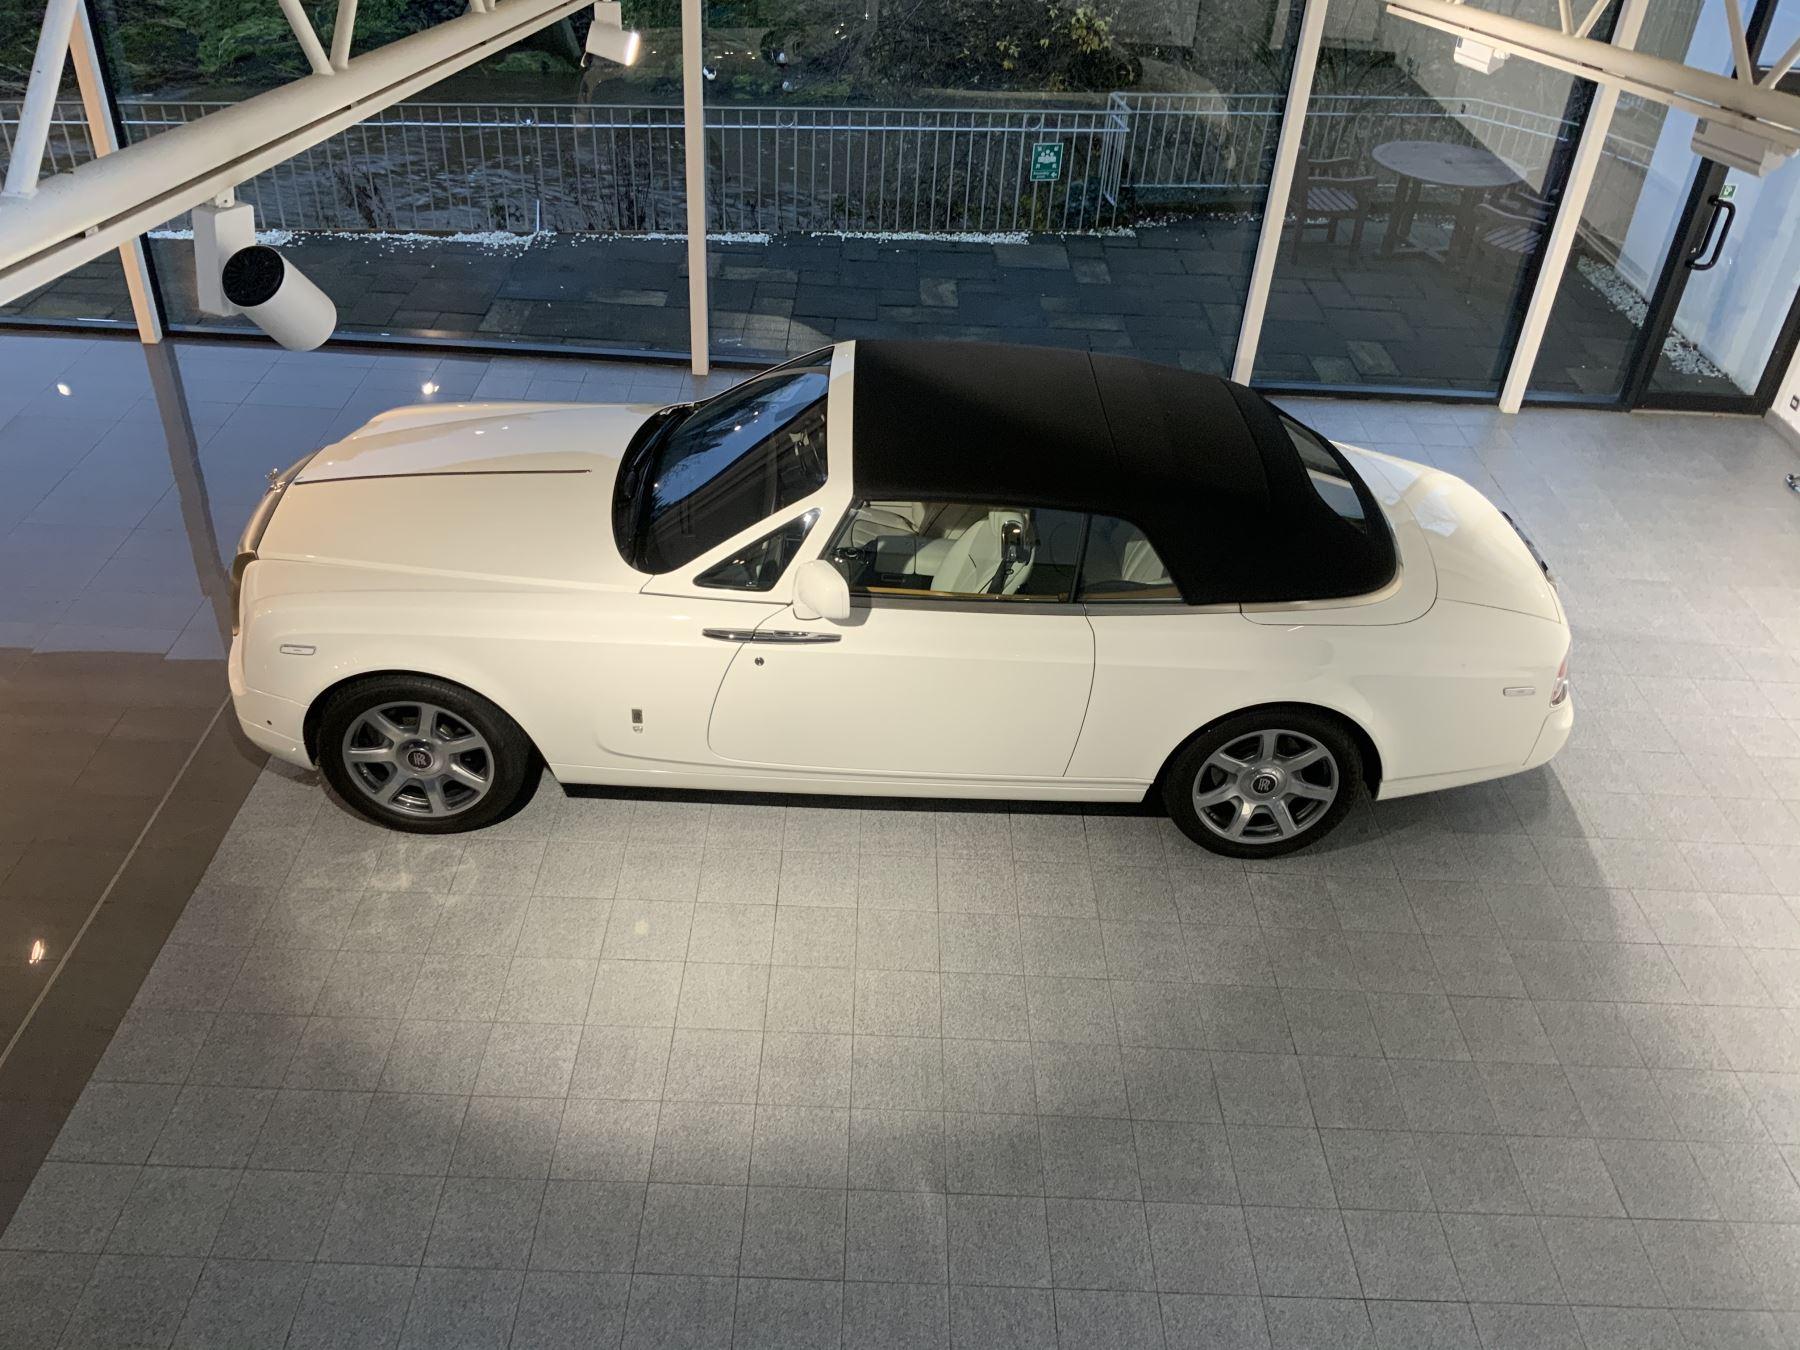 Rolls-Royce Phantom Drophead Coupe Series 2 image 30